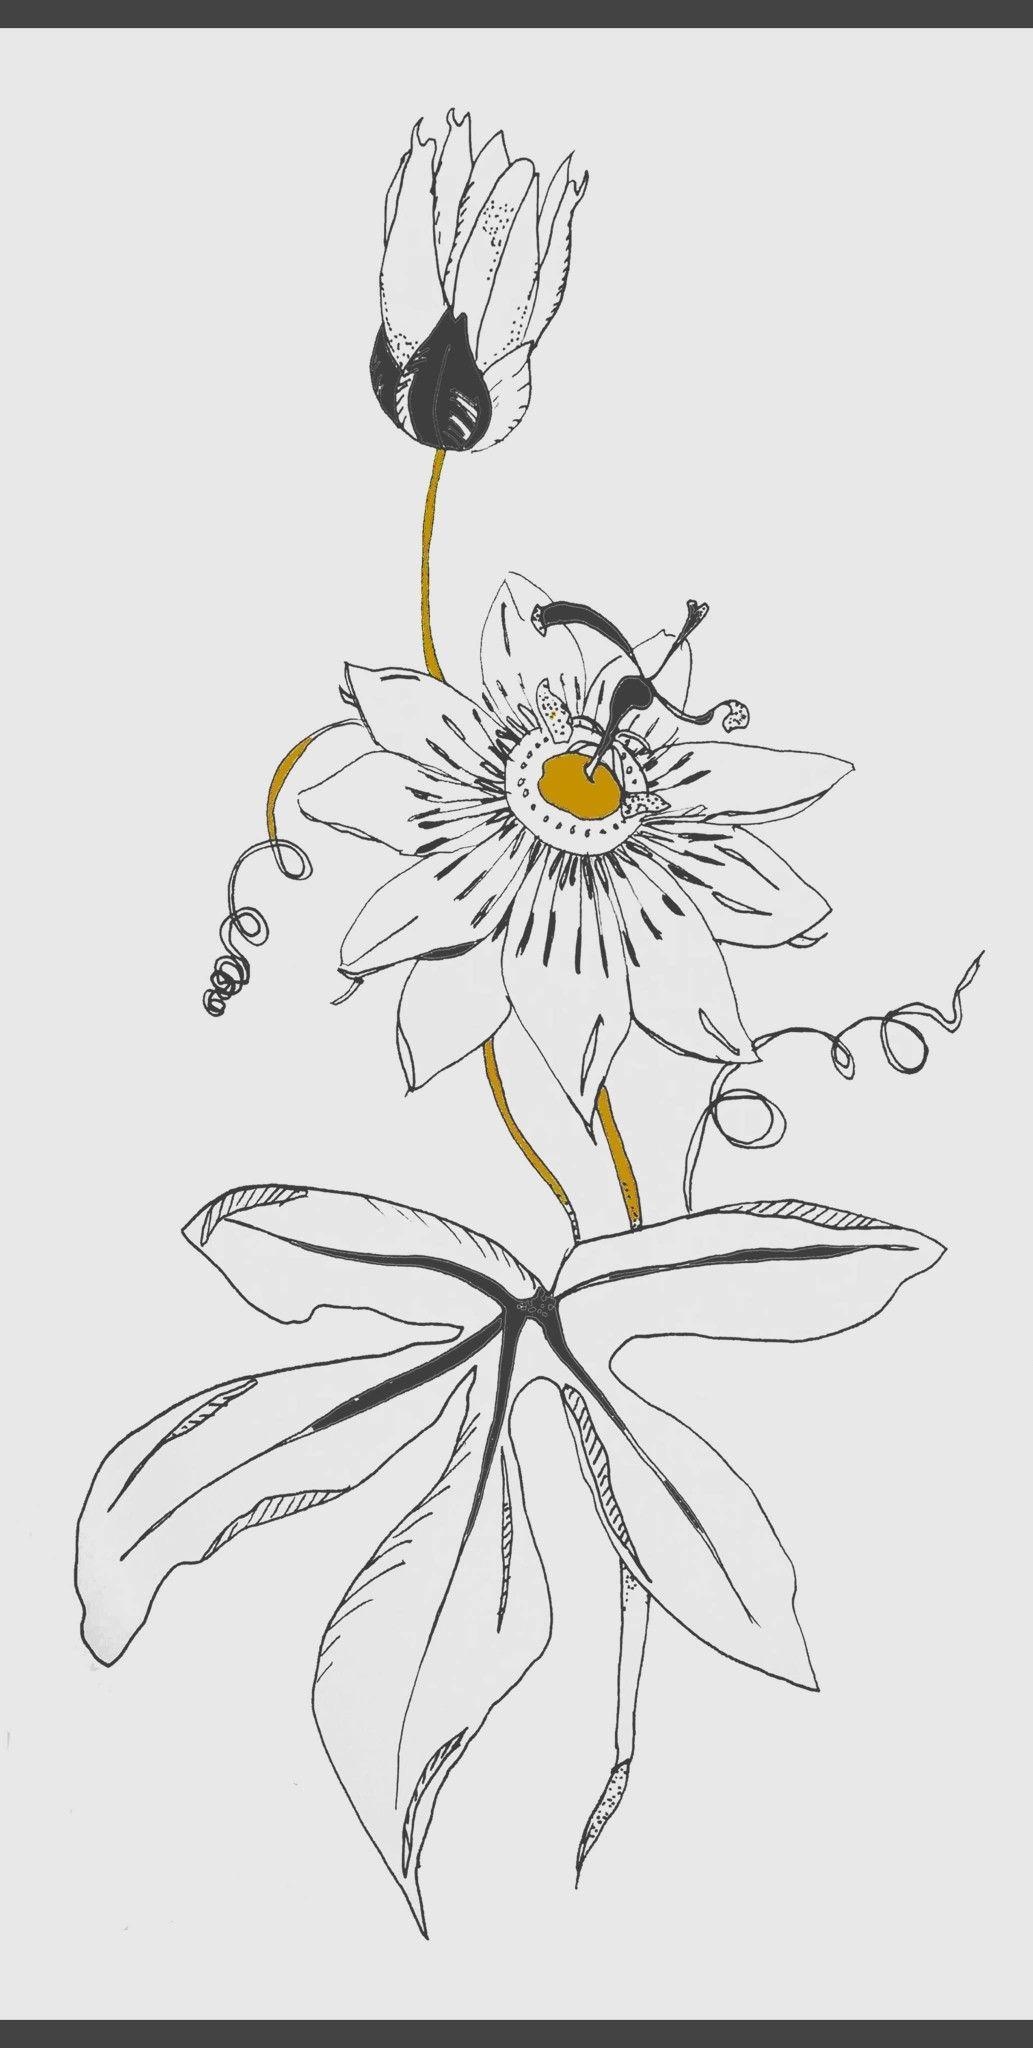 Passion Flower Passion Fruit Flower Doodle Images Flower Sketches